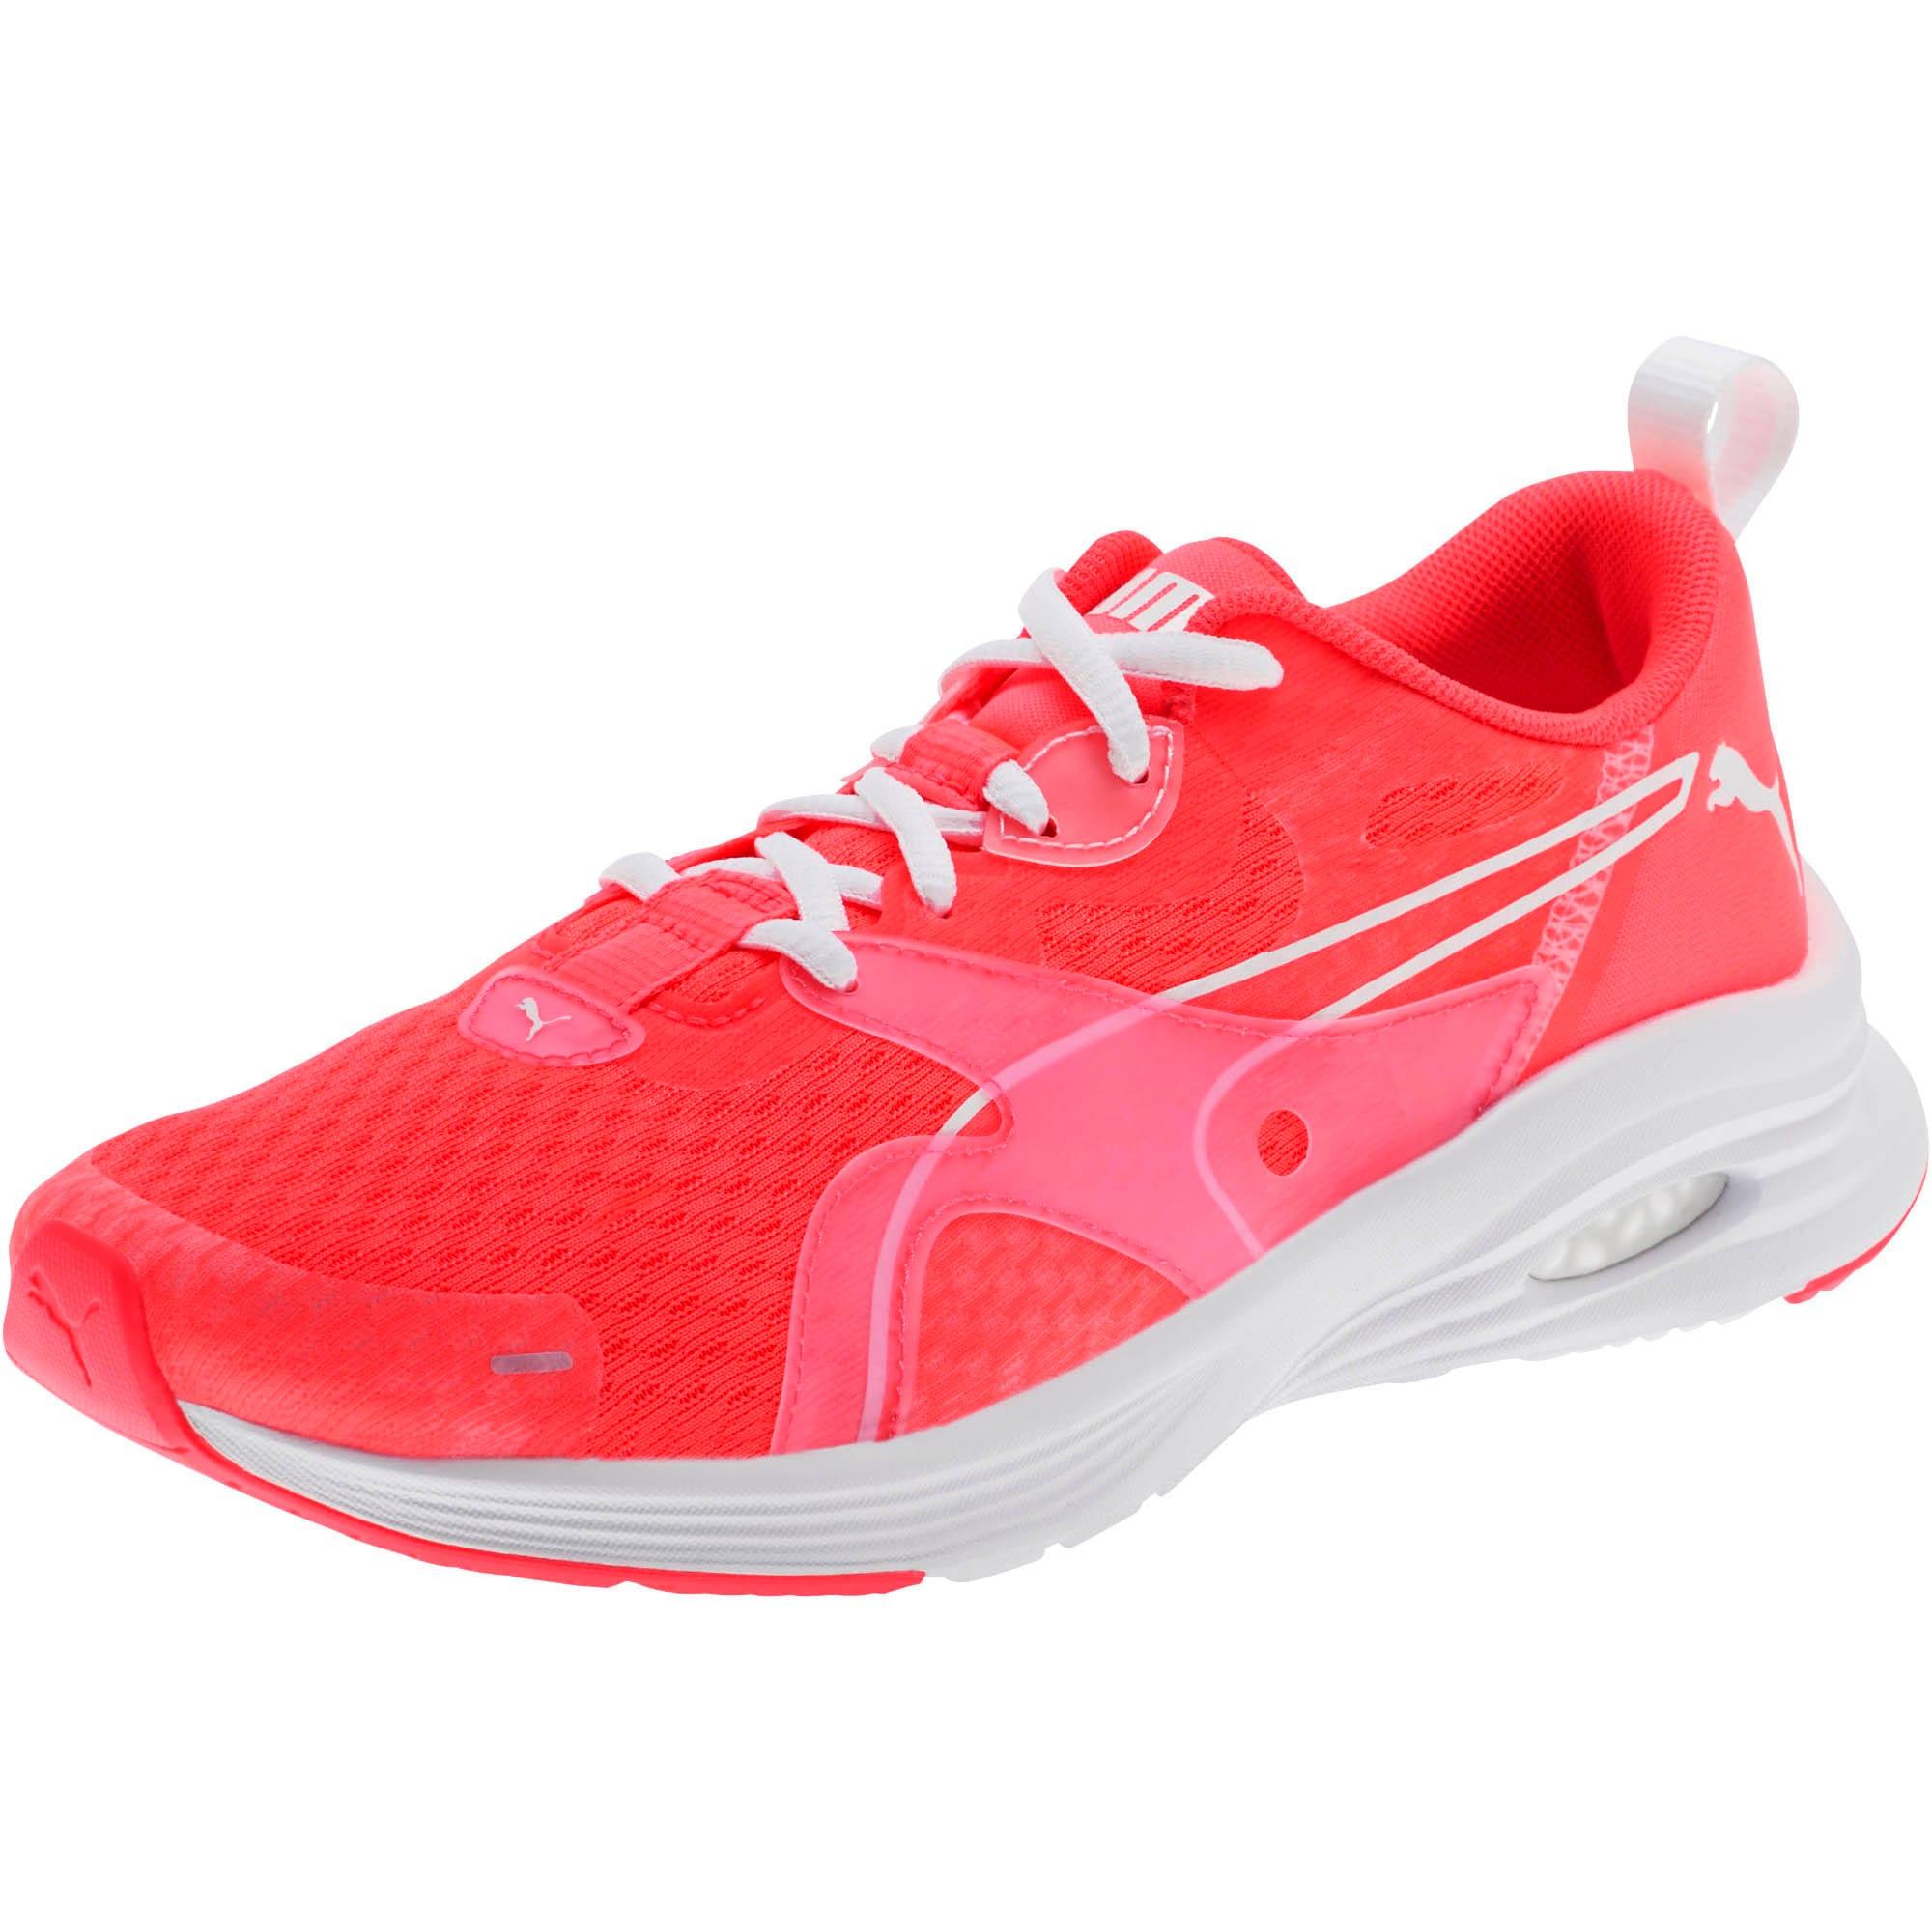 Thumbnail 1 of HYBRID Fuego Women's Running Shoes, Pink Alert-Puma White, medium